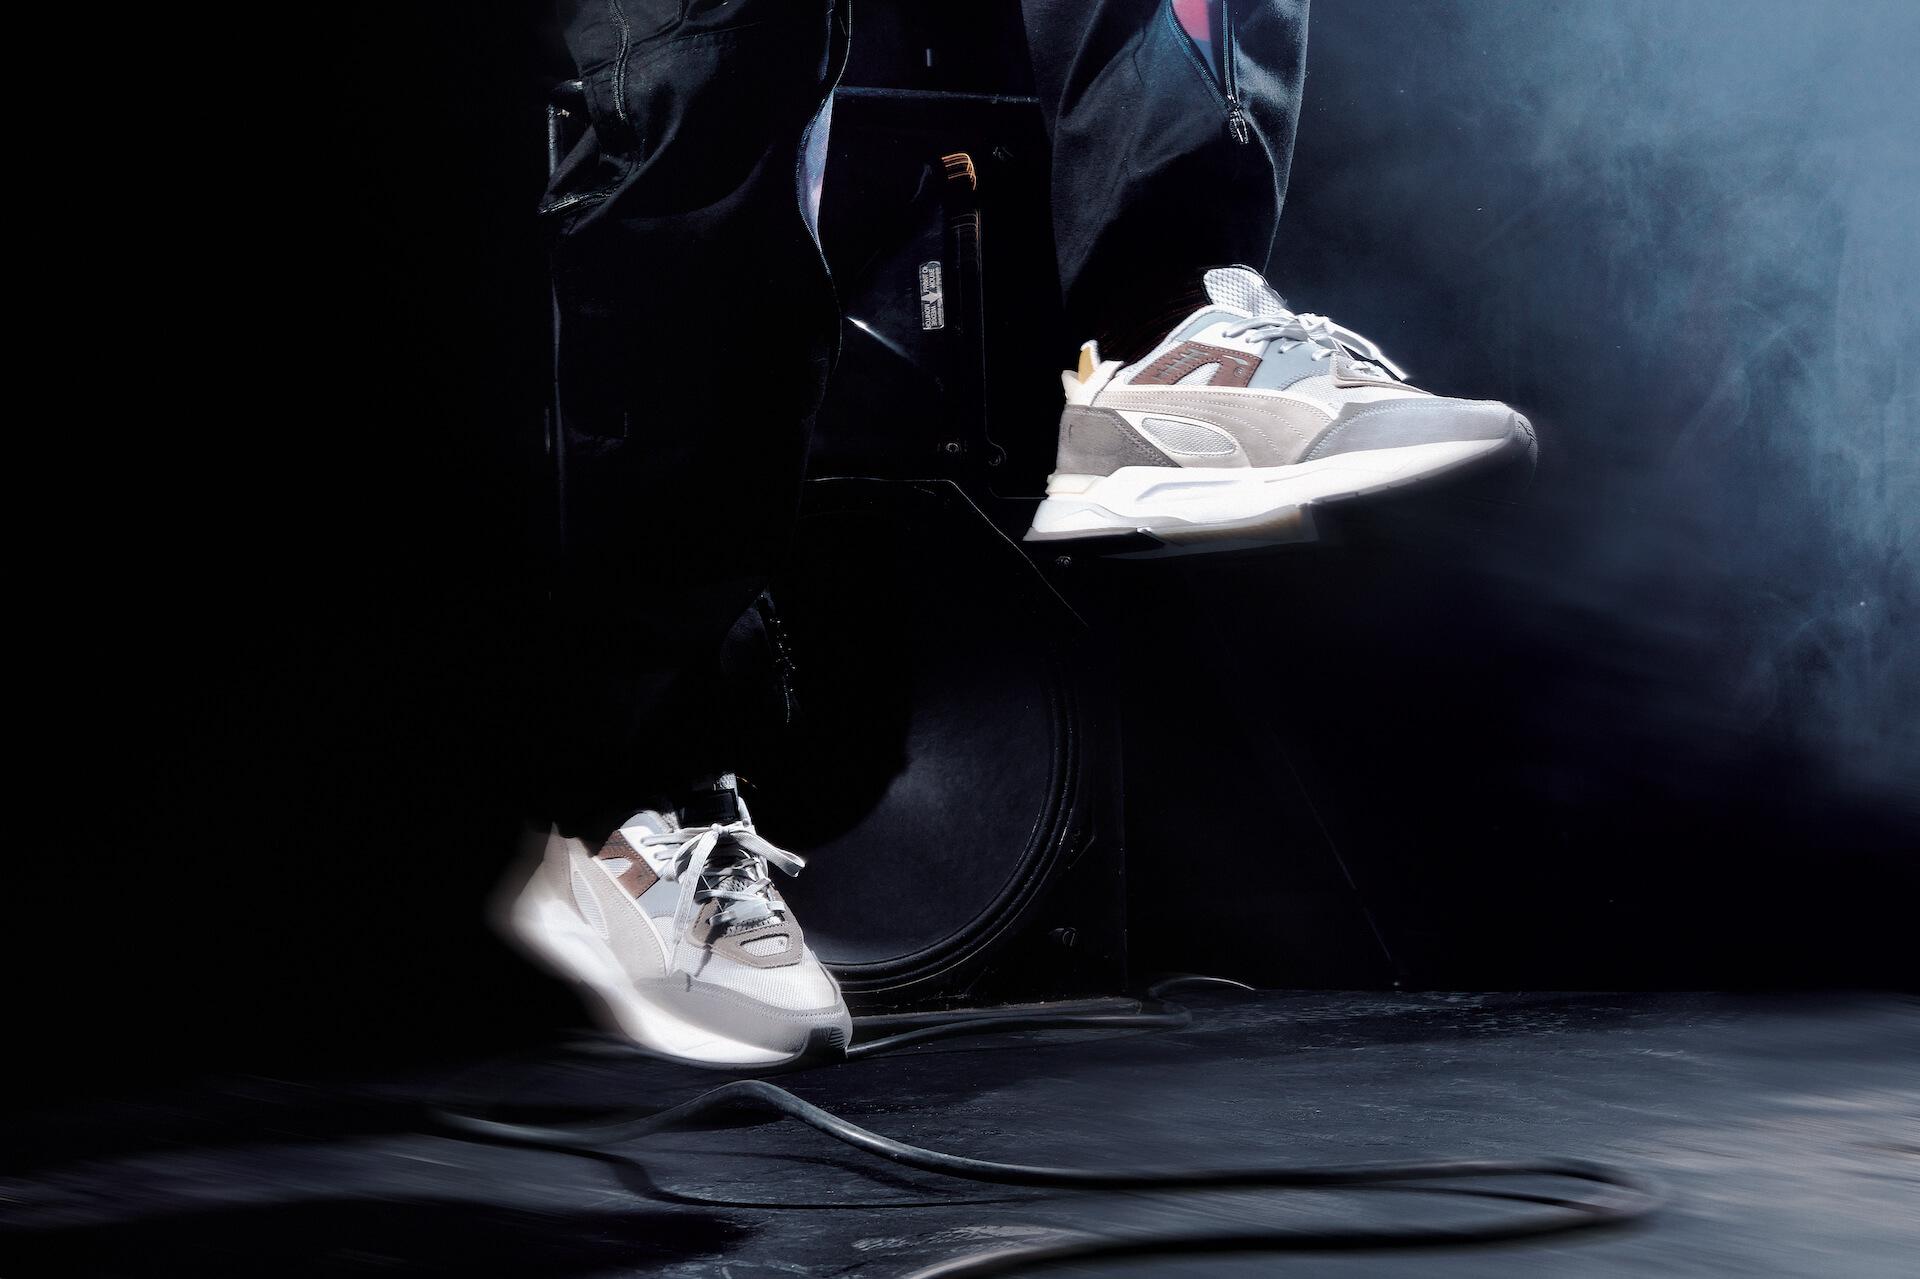 DJカルチャーからインスパイアされたプーマの2021秋冬新作スニーカー「プーマ ミラージュ スポーツ」が発売決定! life210604_puma_mirage_2